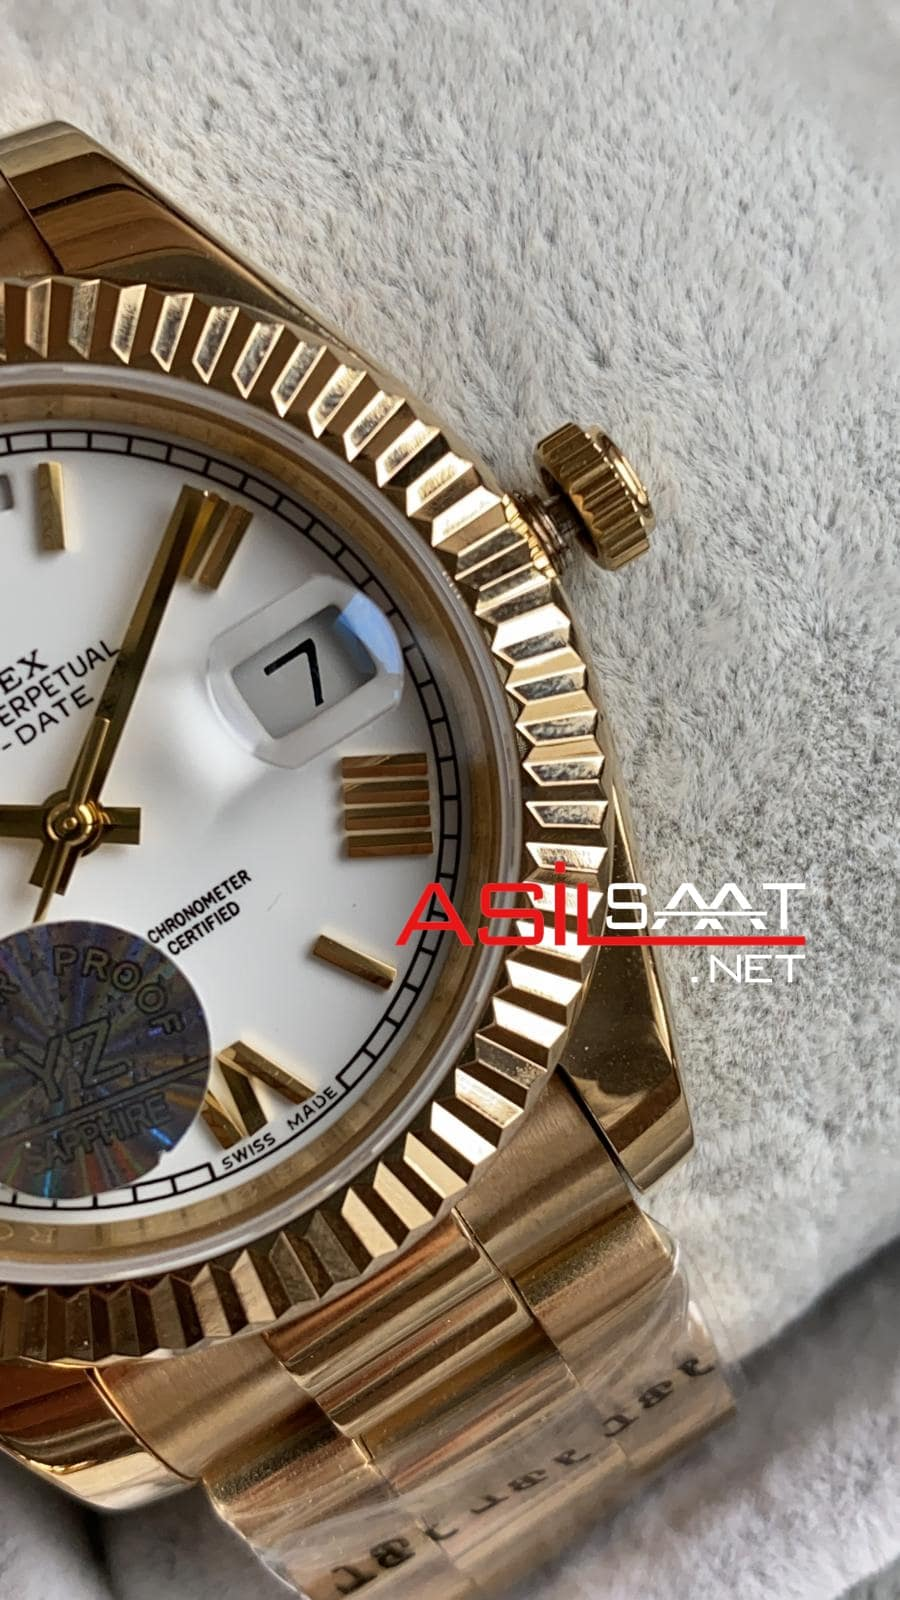 Rolex Day-Date Gold Replika Saat ROLDD022